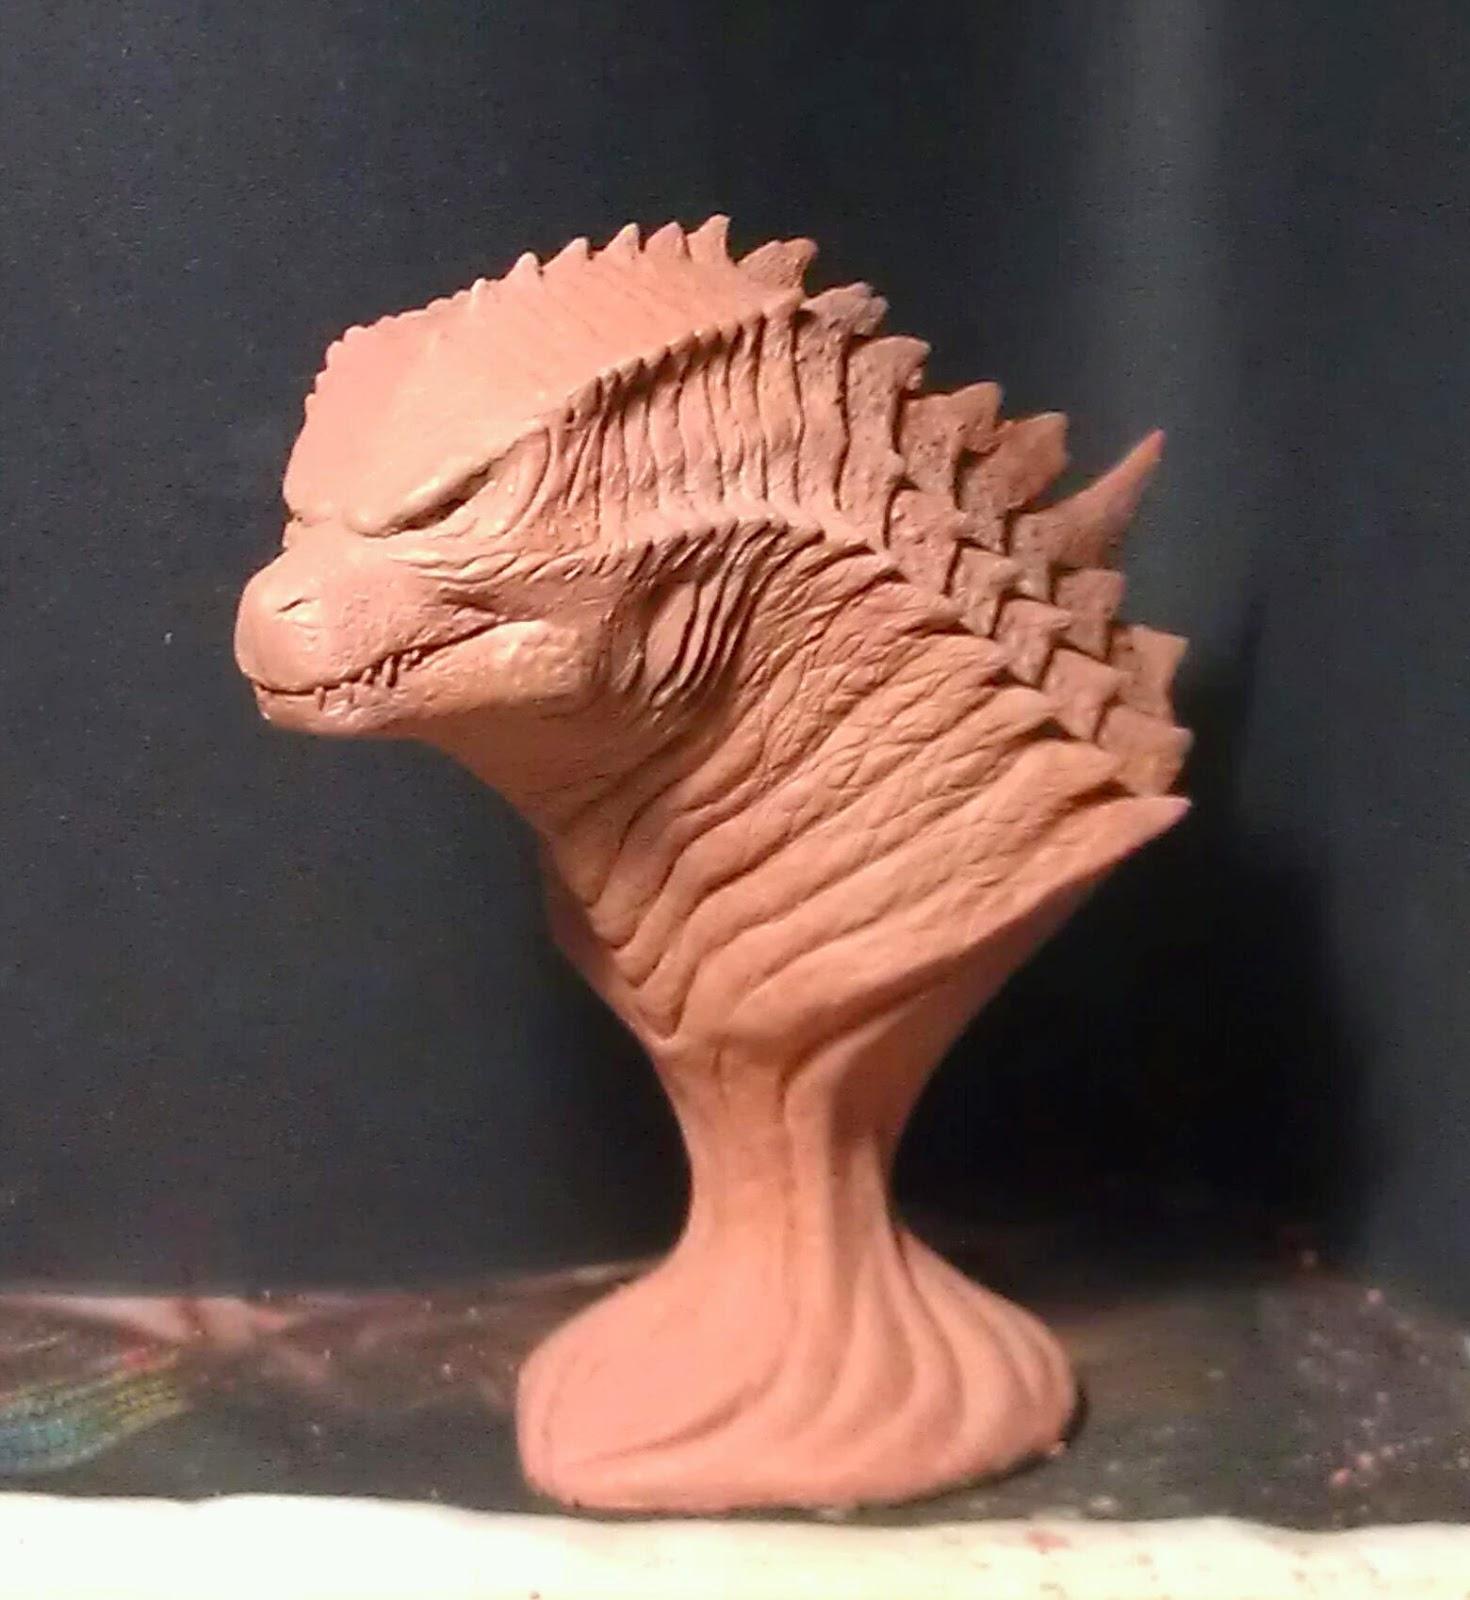 S H Sculpture Design Studio Godzilla 2014 Statue